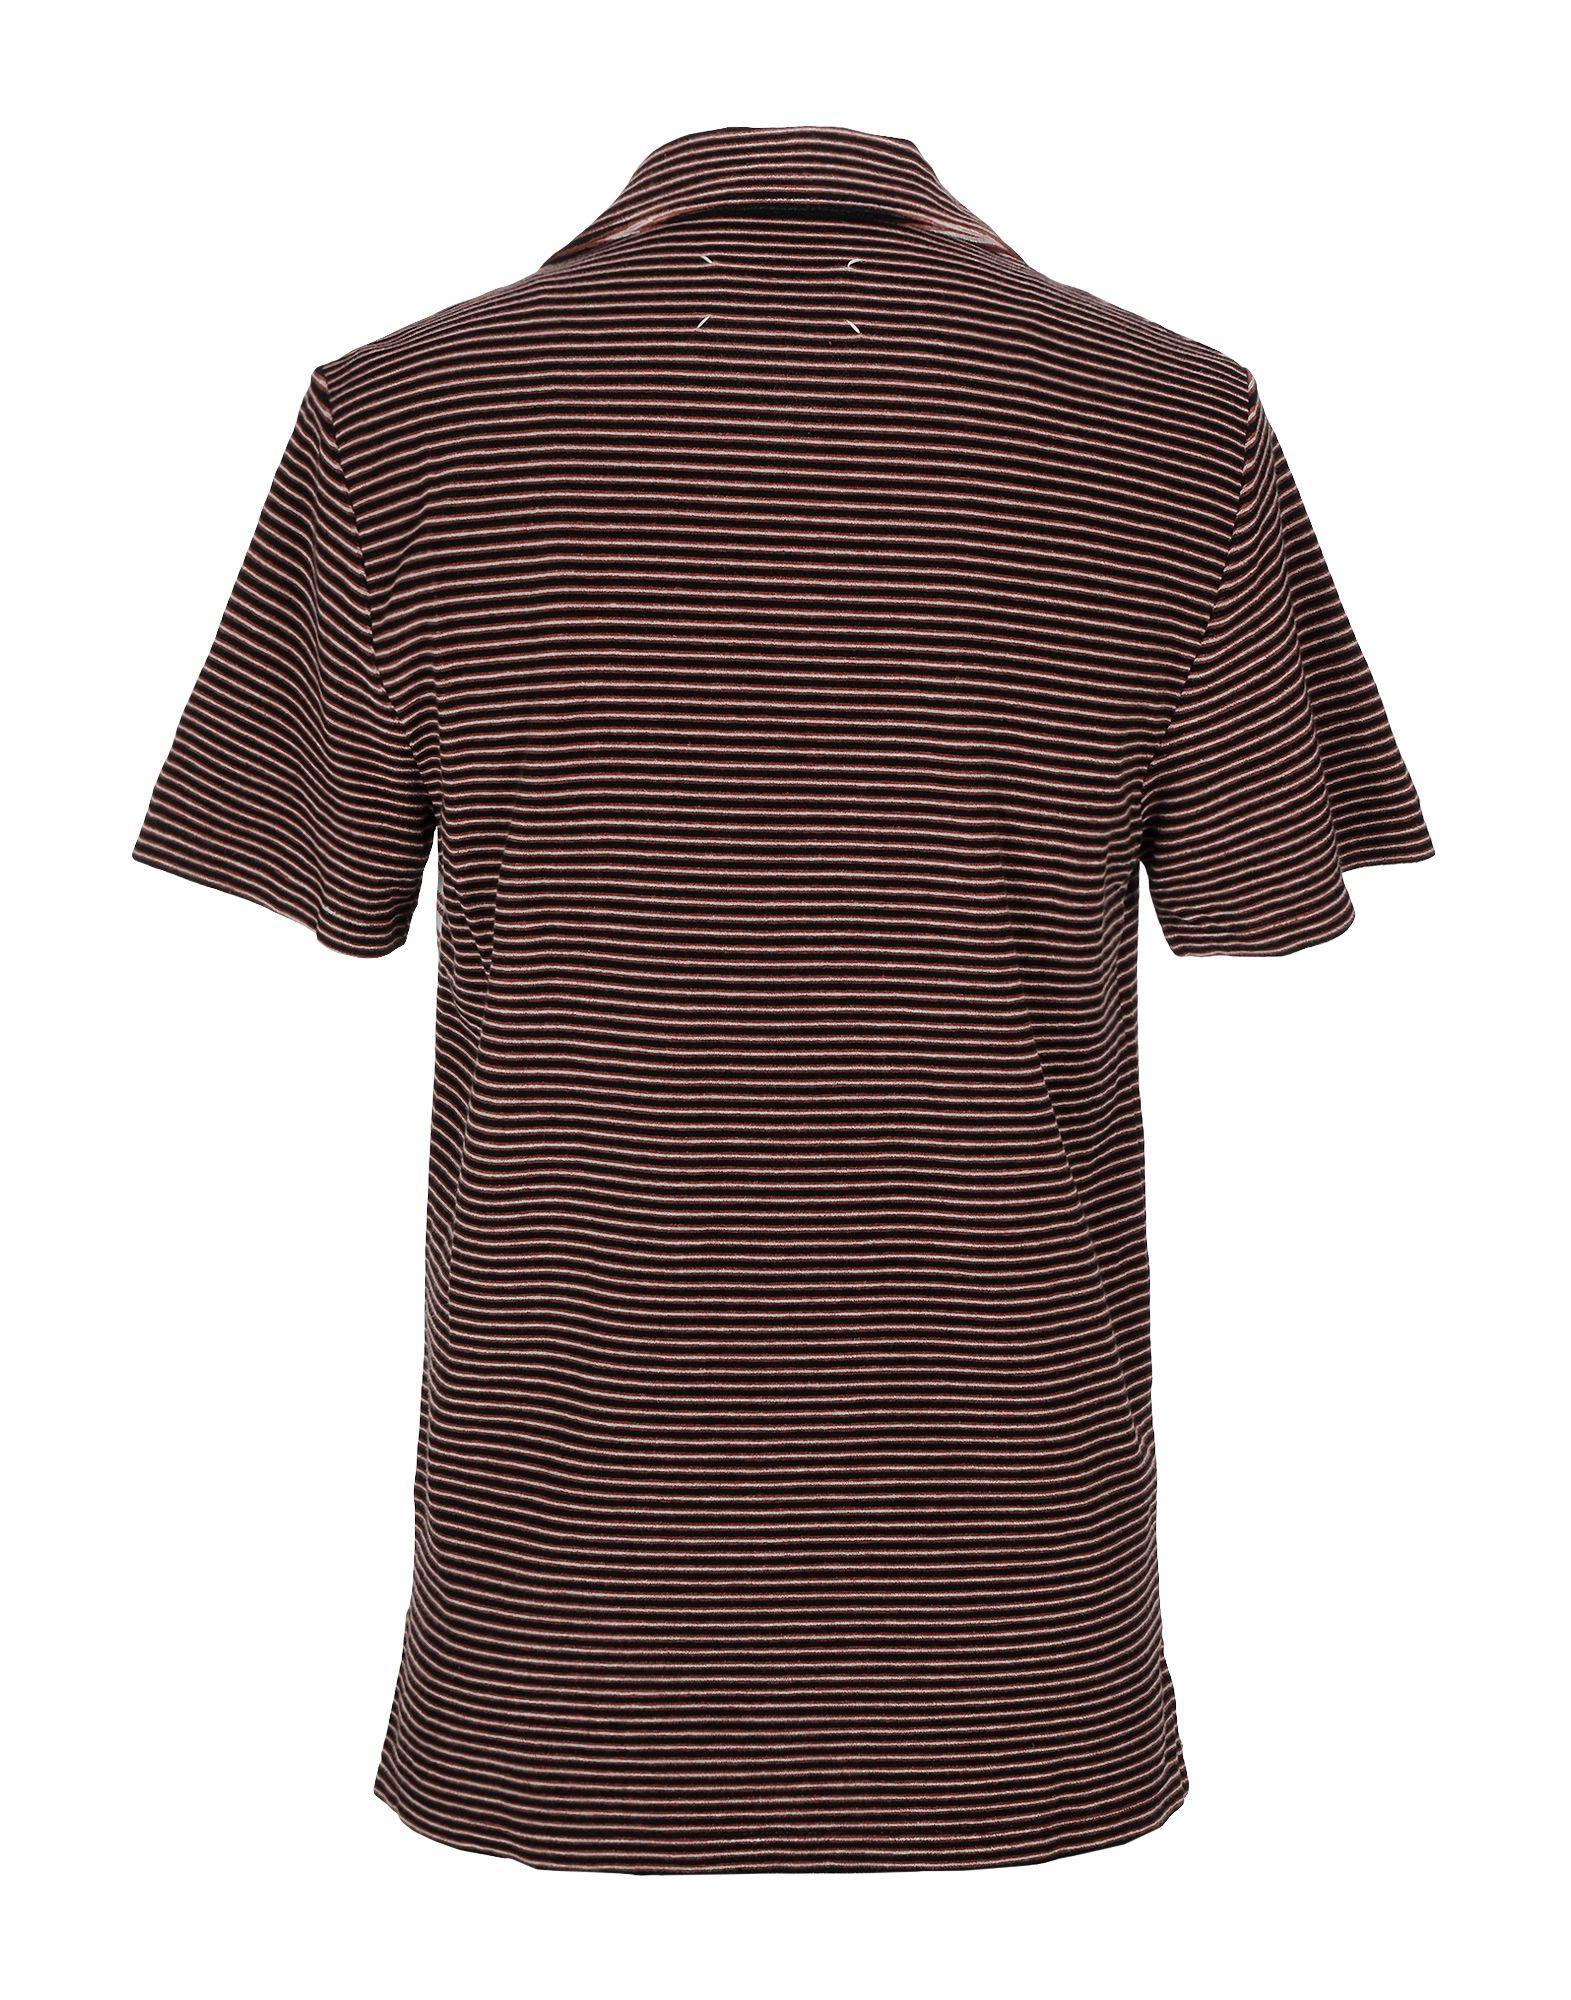 Maison Margiela Cotton Polo Shirt in Brown for Men